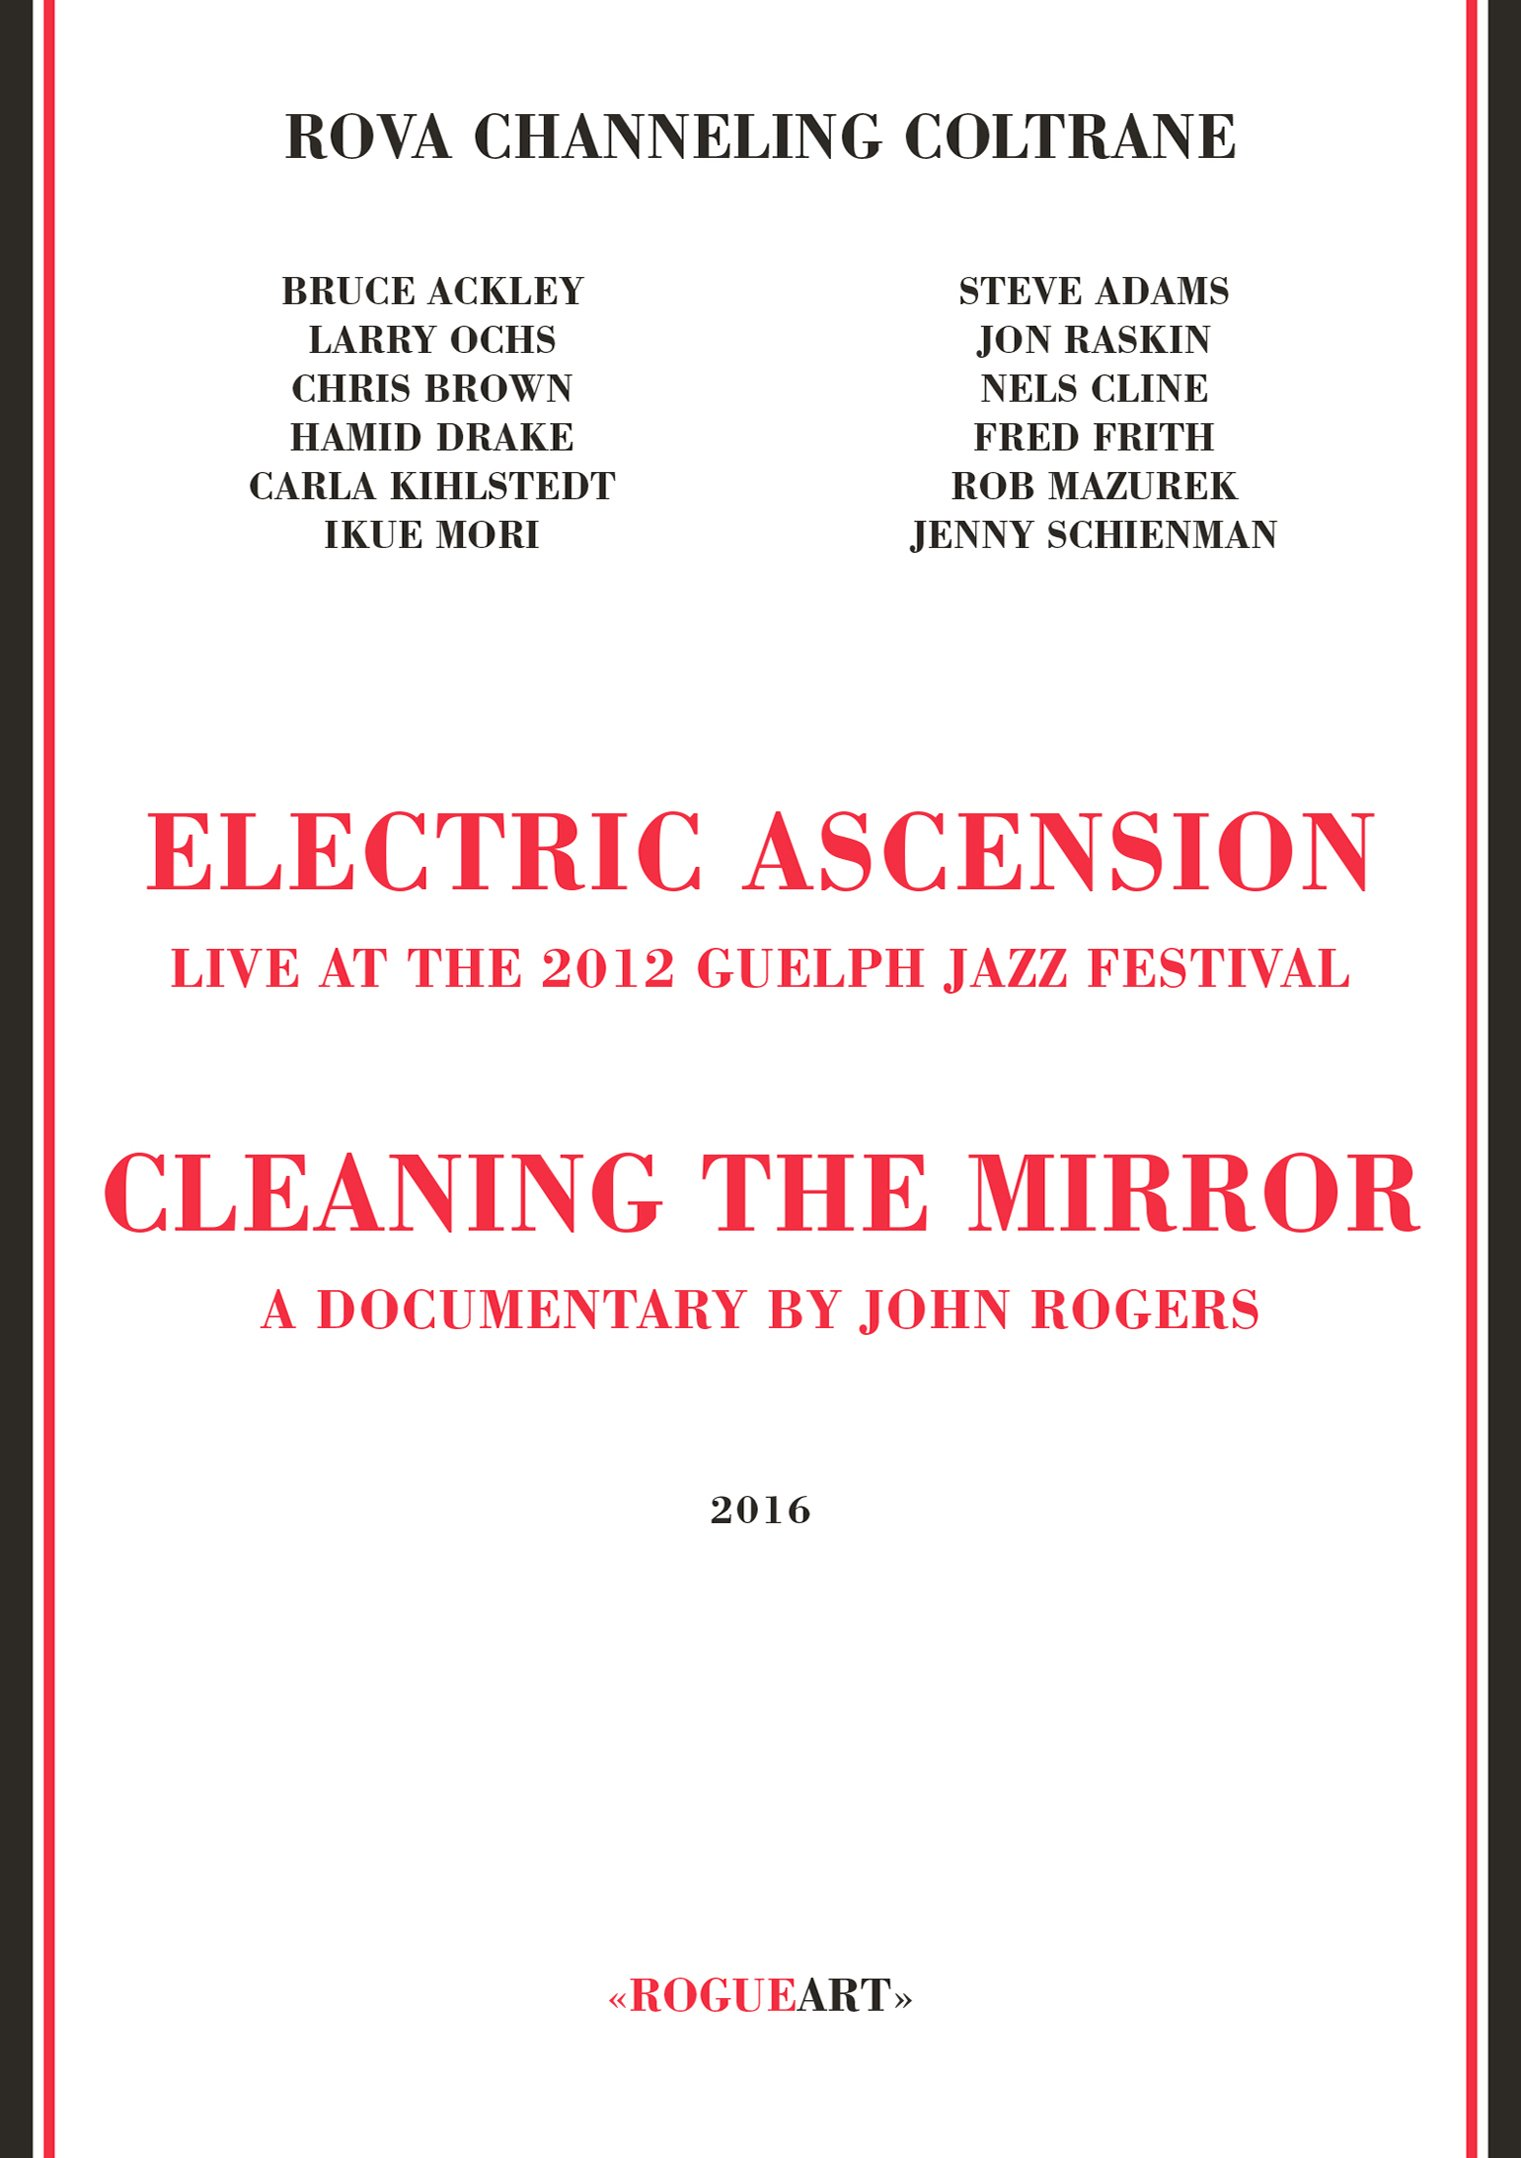 Rova Channeling Coltrane - Electric Ascension [Blu-ray/DVD/CD]